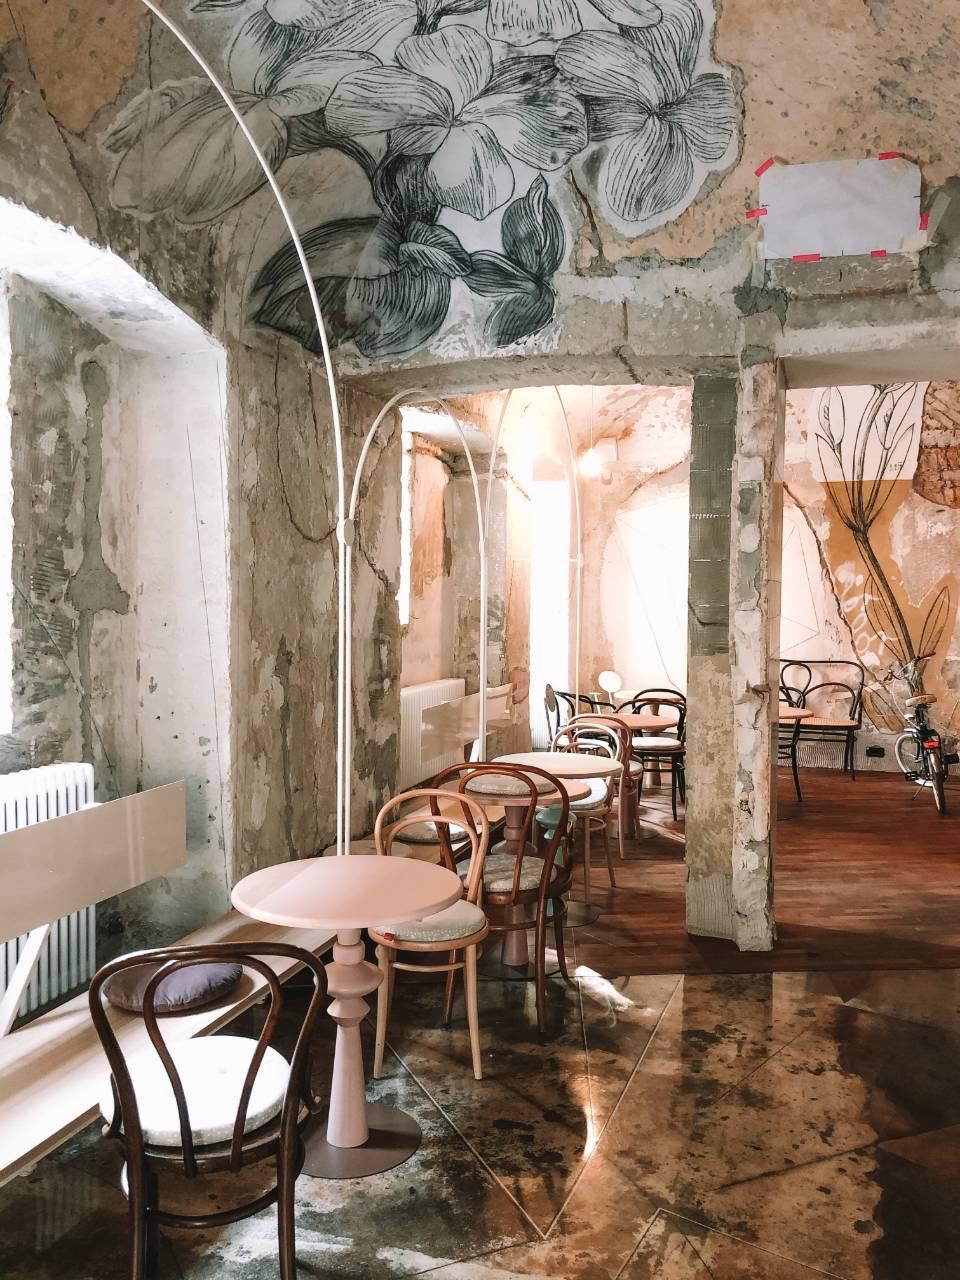 Lolita Eipprova obokani strop